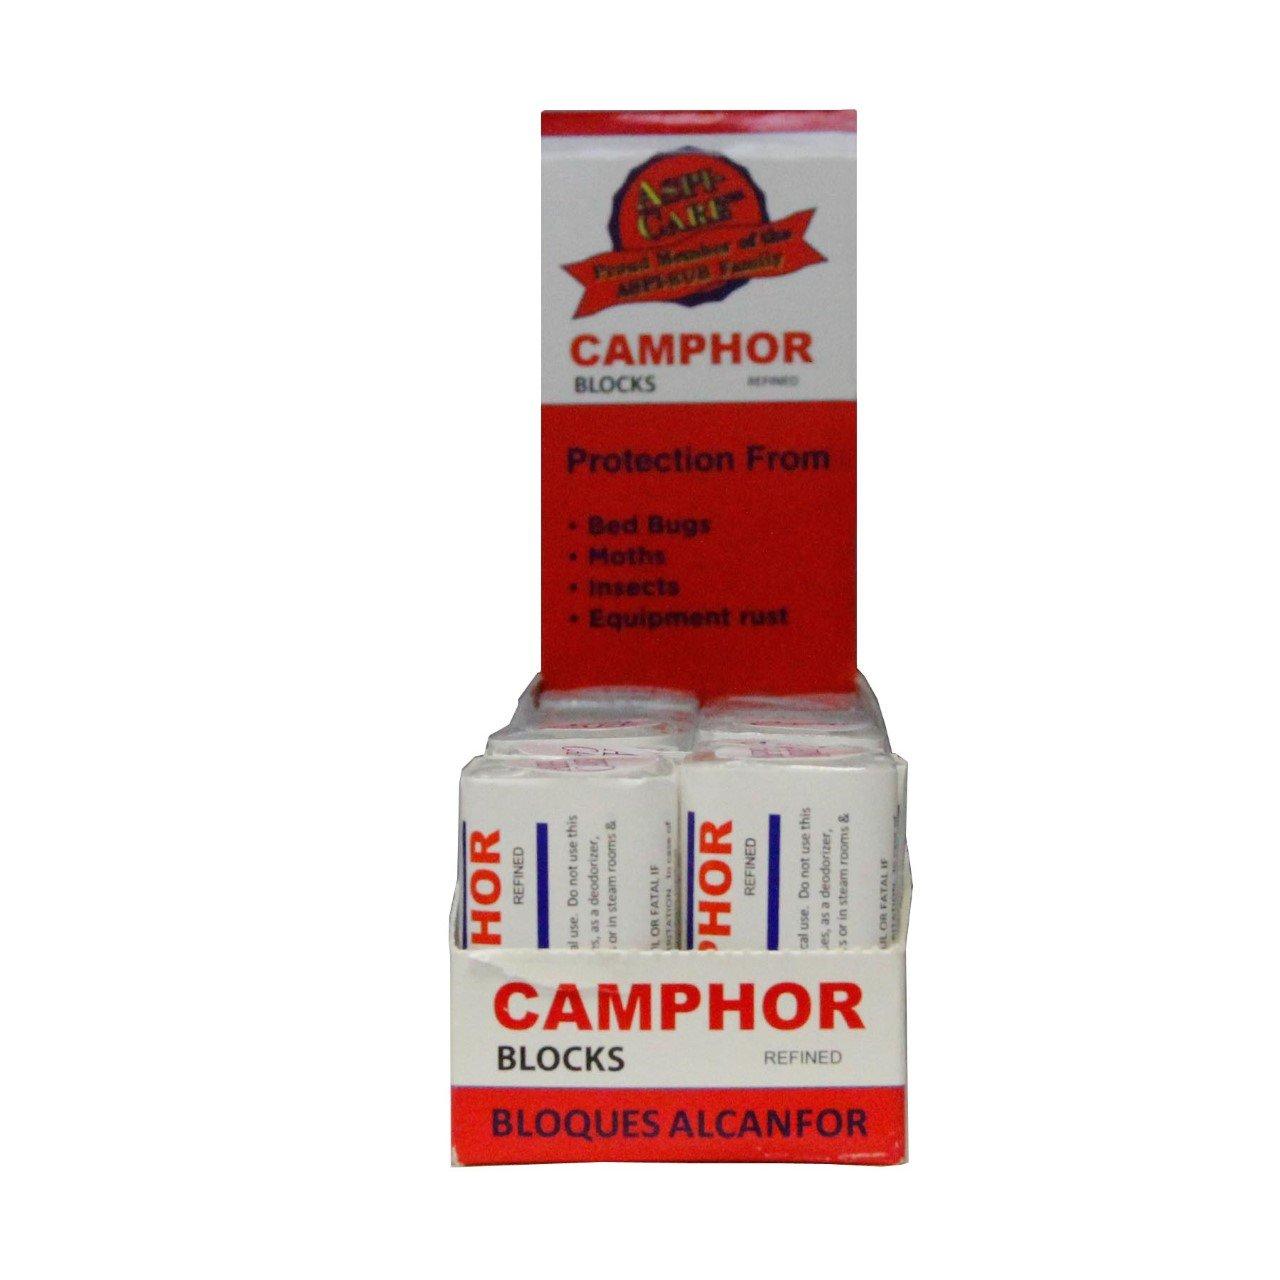 Box of Camphor 16 Blocks - 64 Tablets Premium Refined Camphor - No Residue - Bed Bug - Tool Tarnish Made in USA